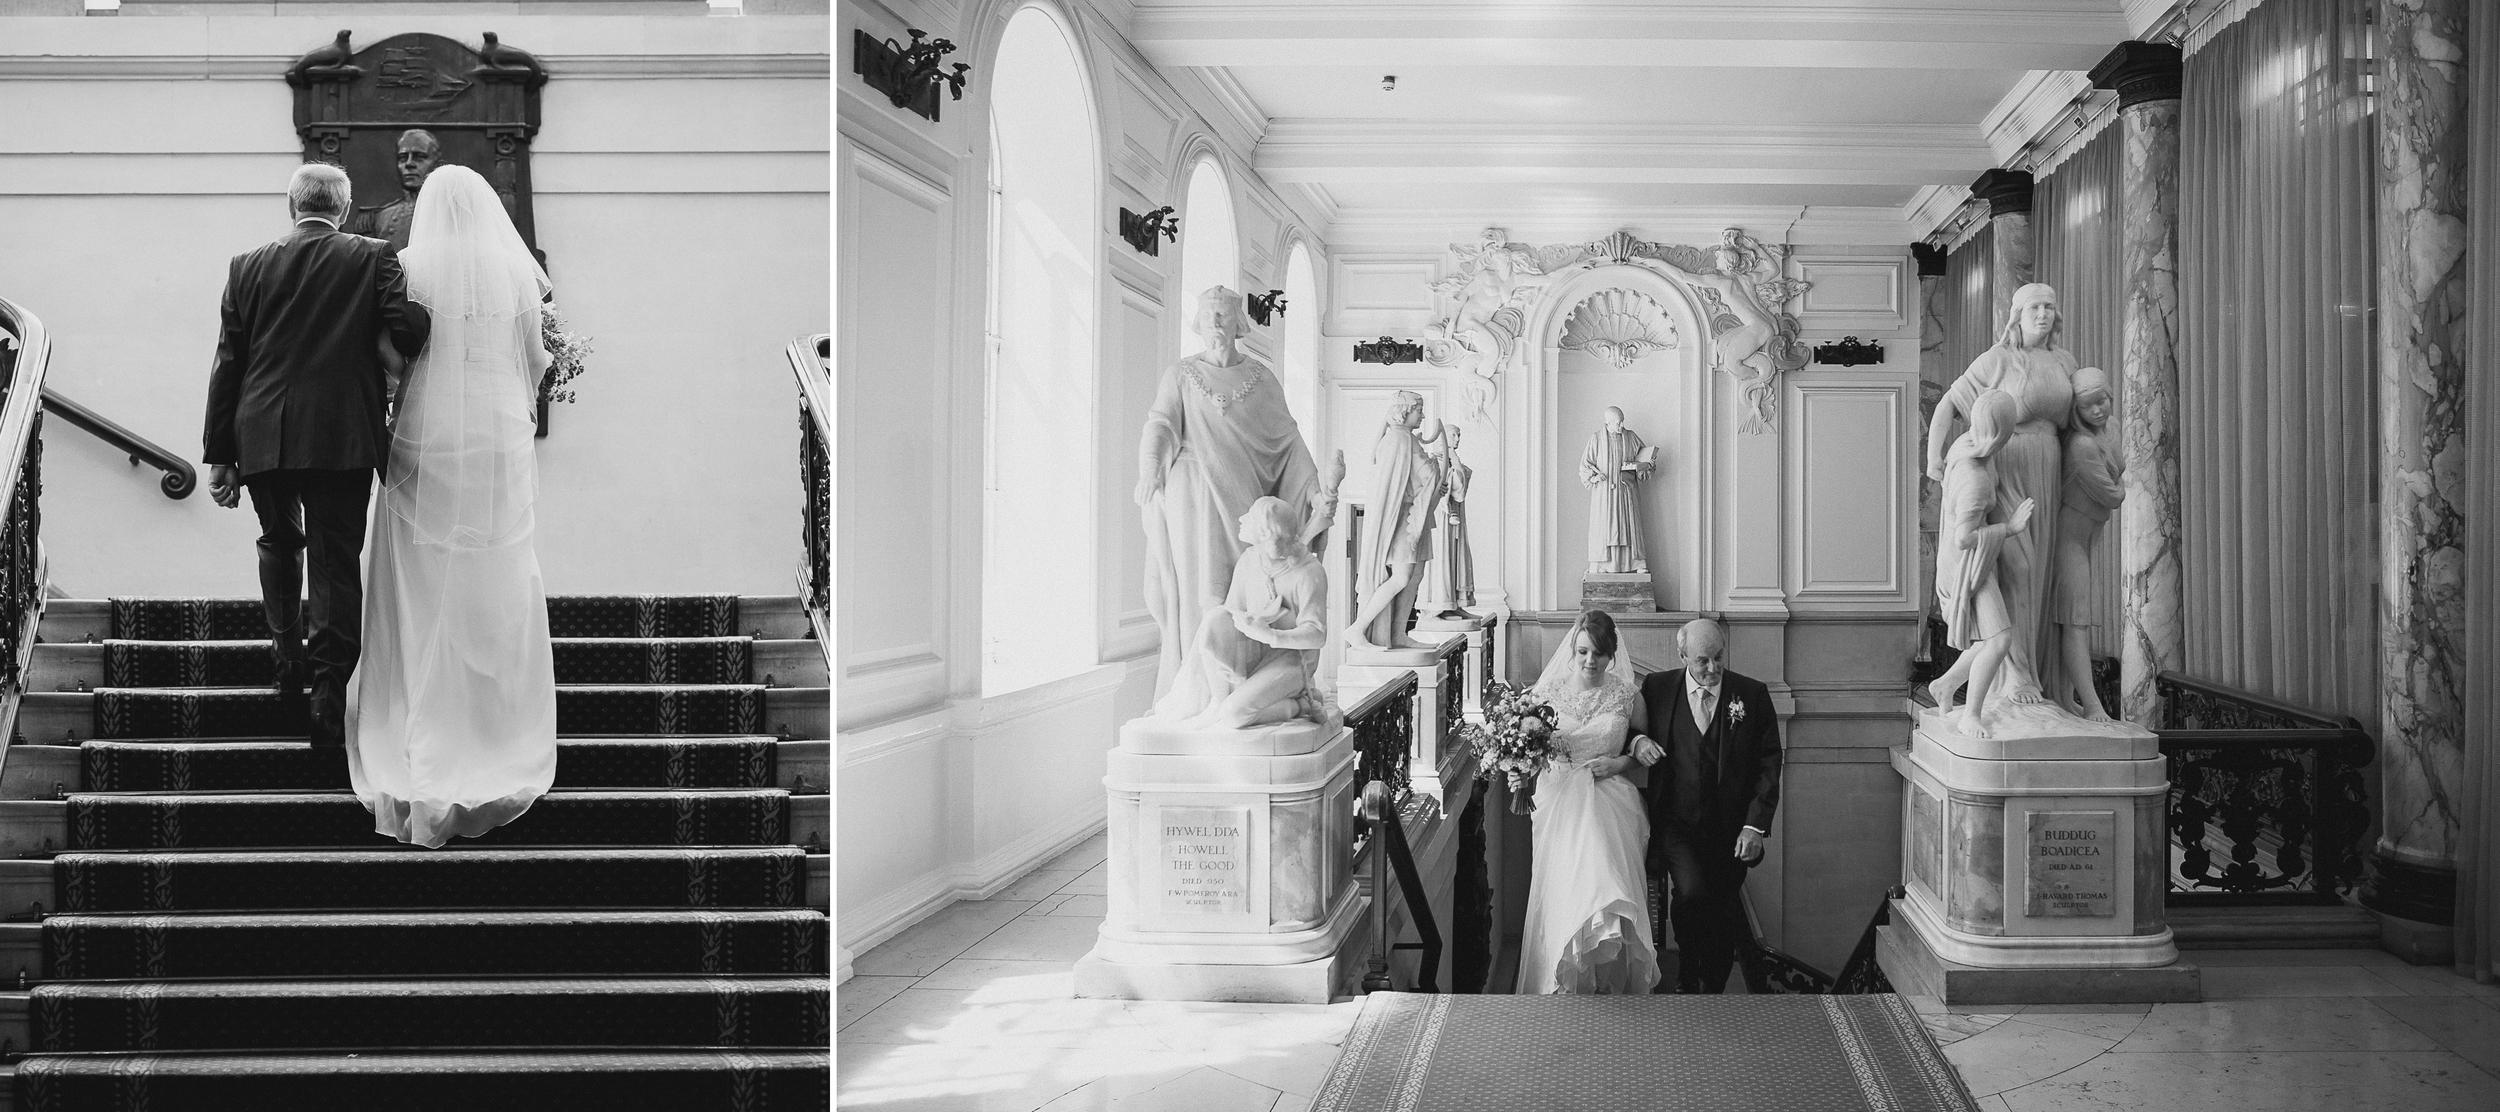 cardiff registry office wedding photography